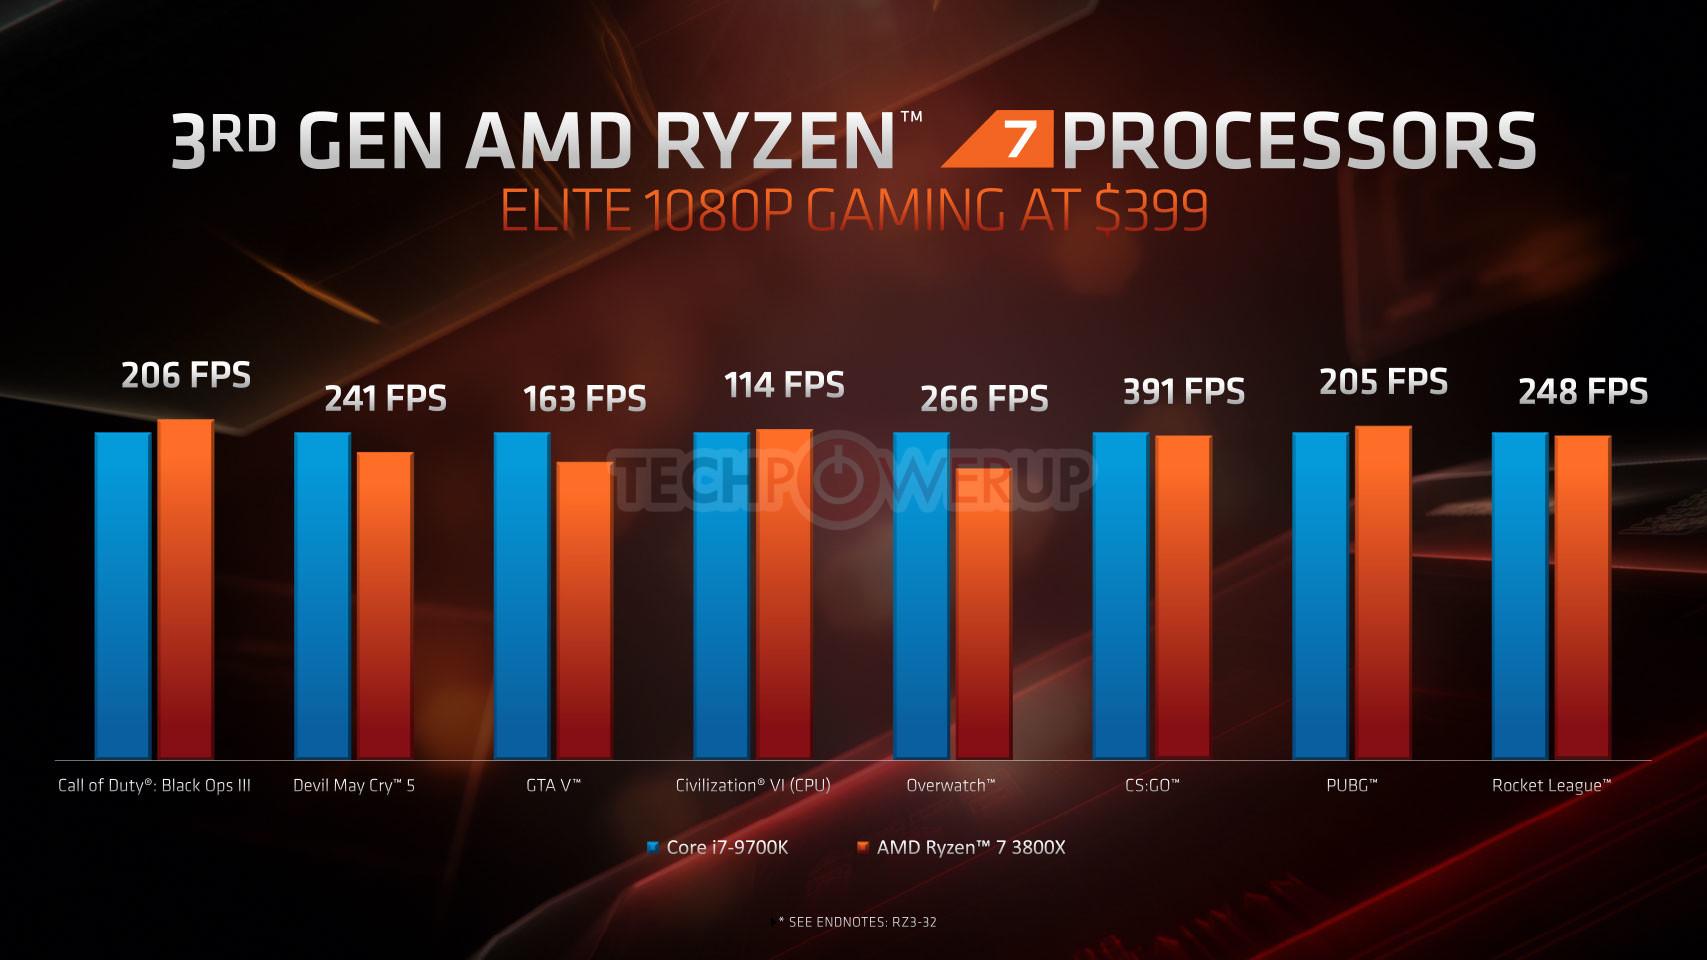 AMD Ryzen 5 3600 Beats Intel Core i9-9900KF at PassMark